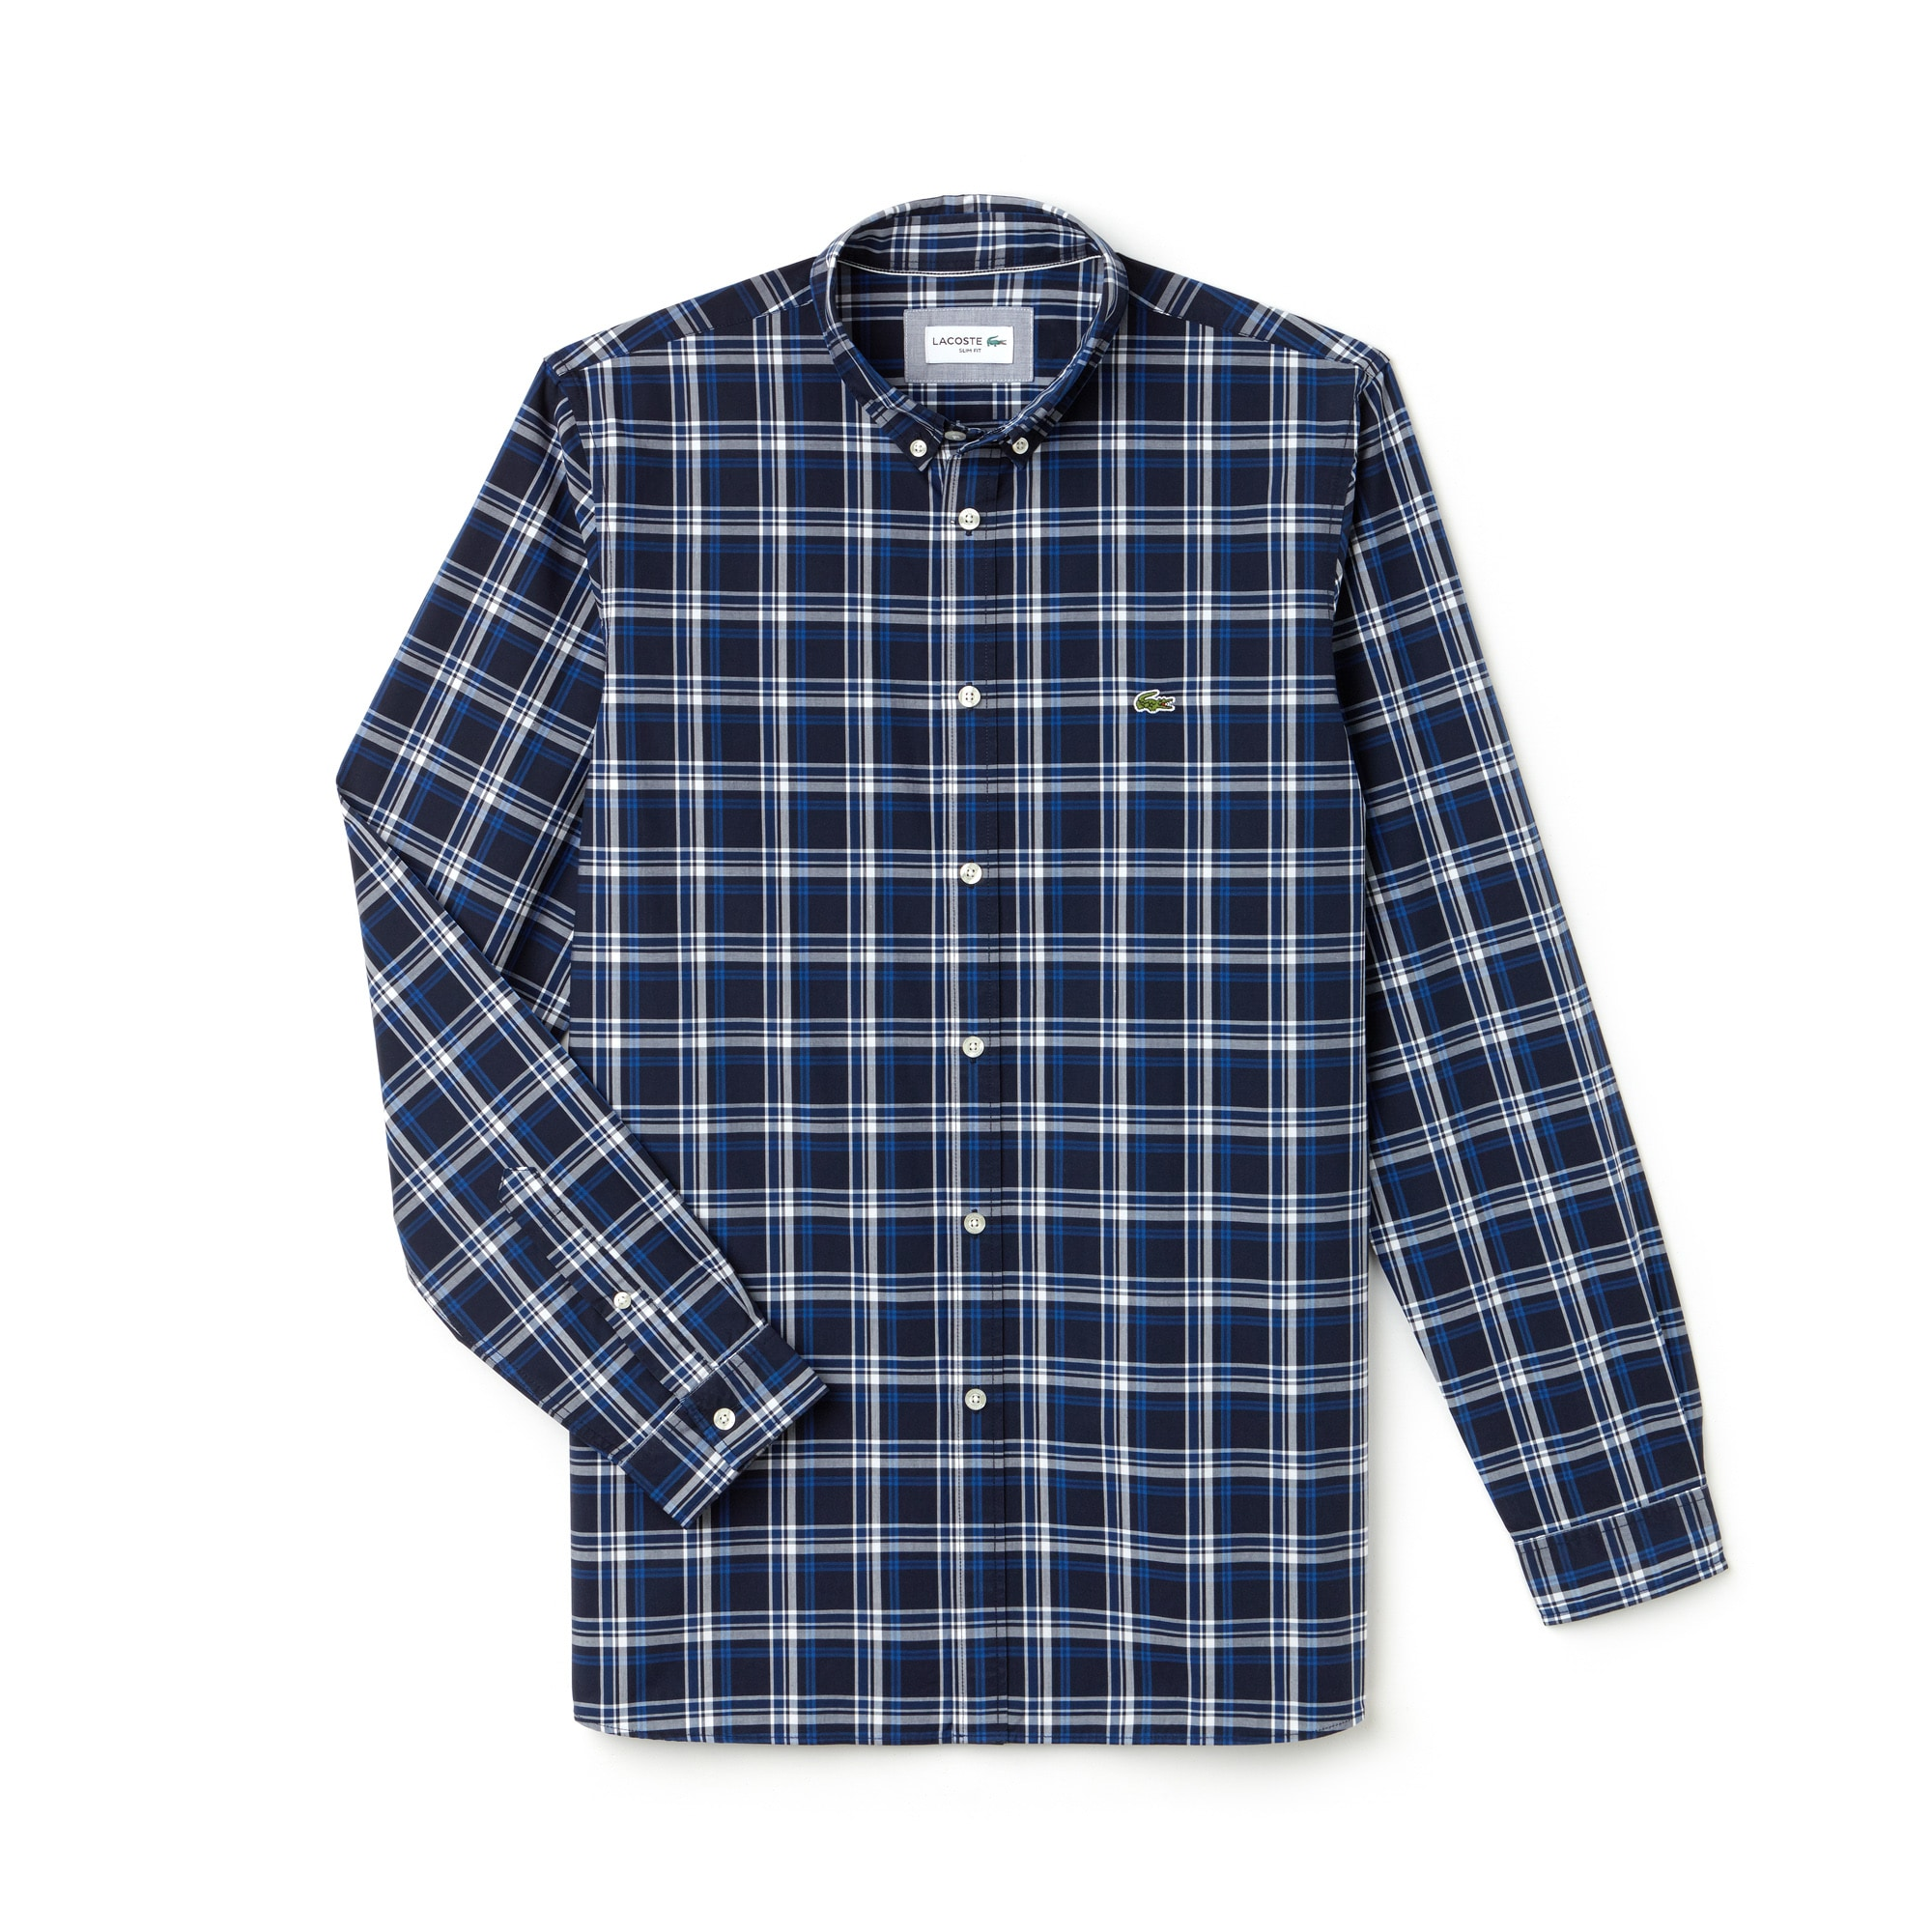 Men's Slim Fit Wide Check Poplin Shirt